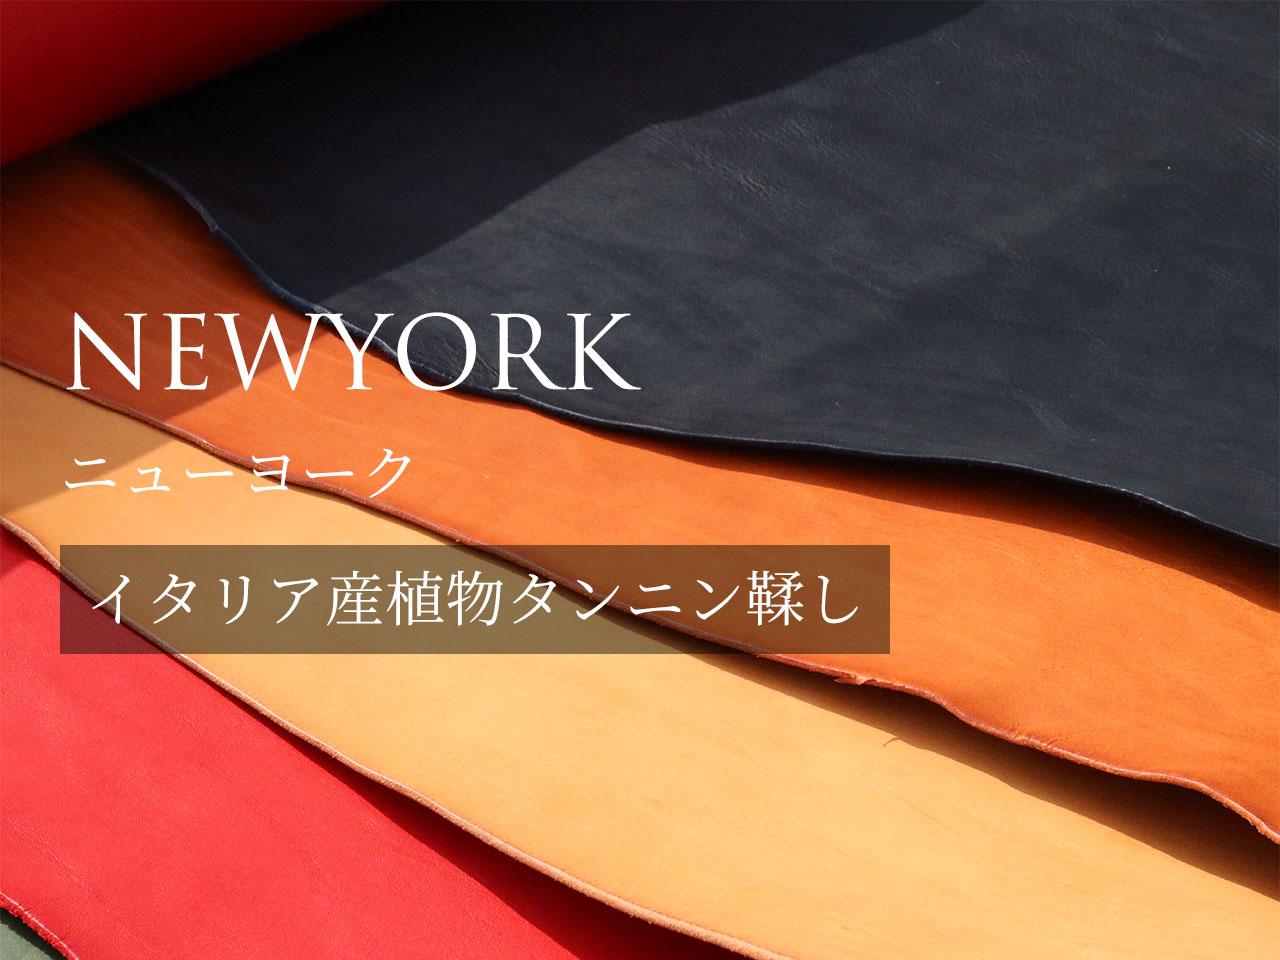 NEWYORK(ニューヨーク)について